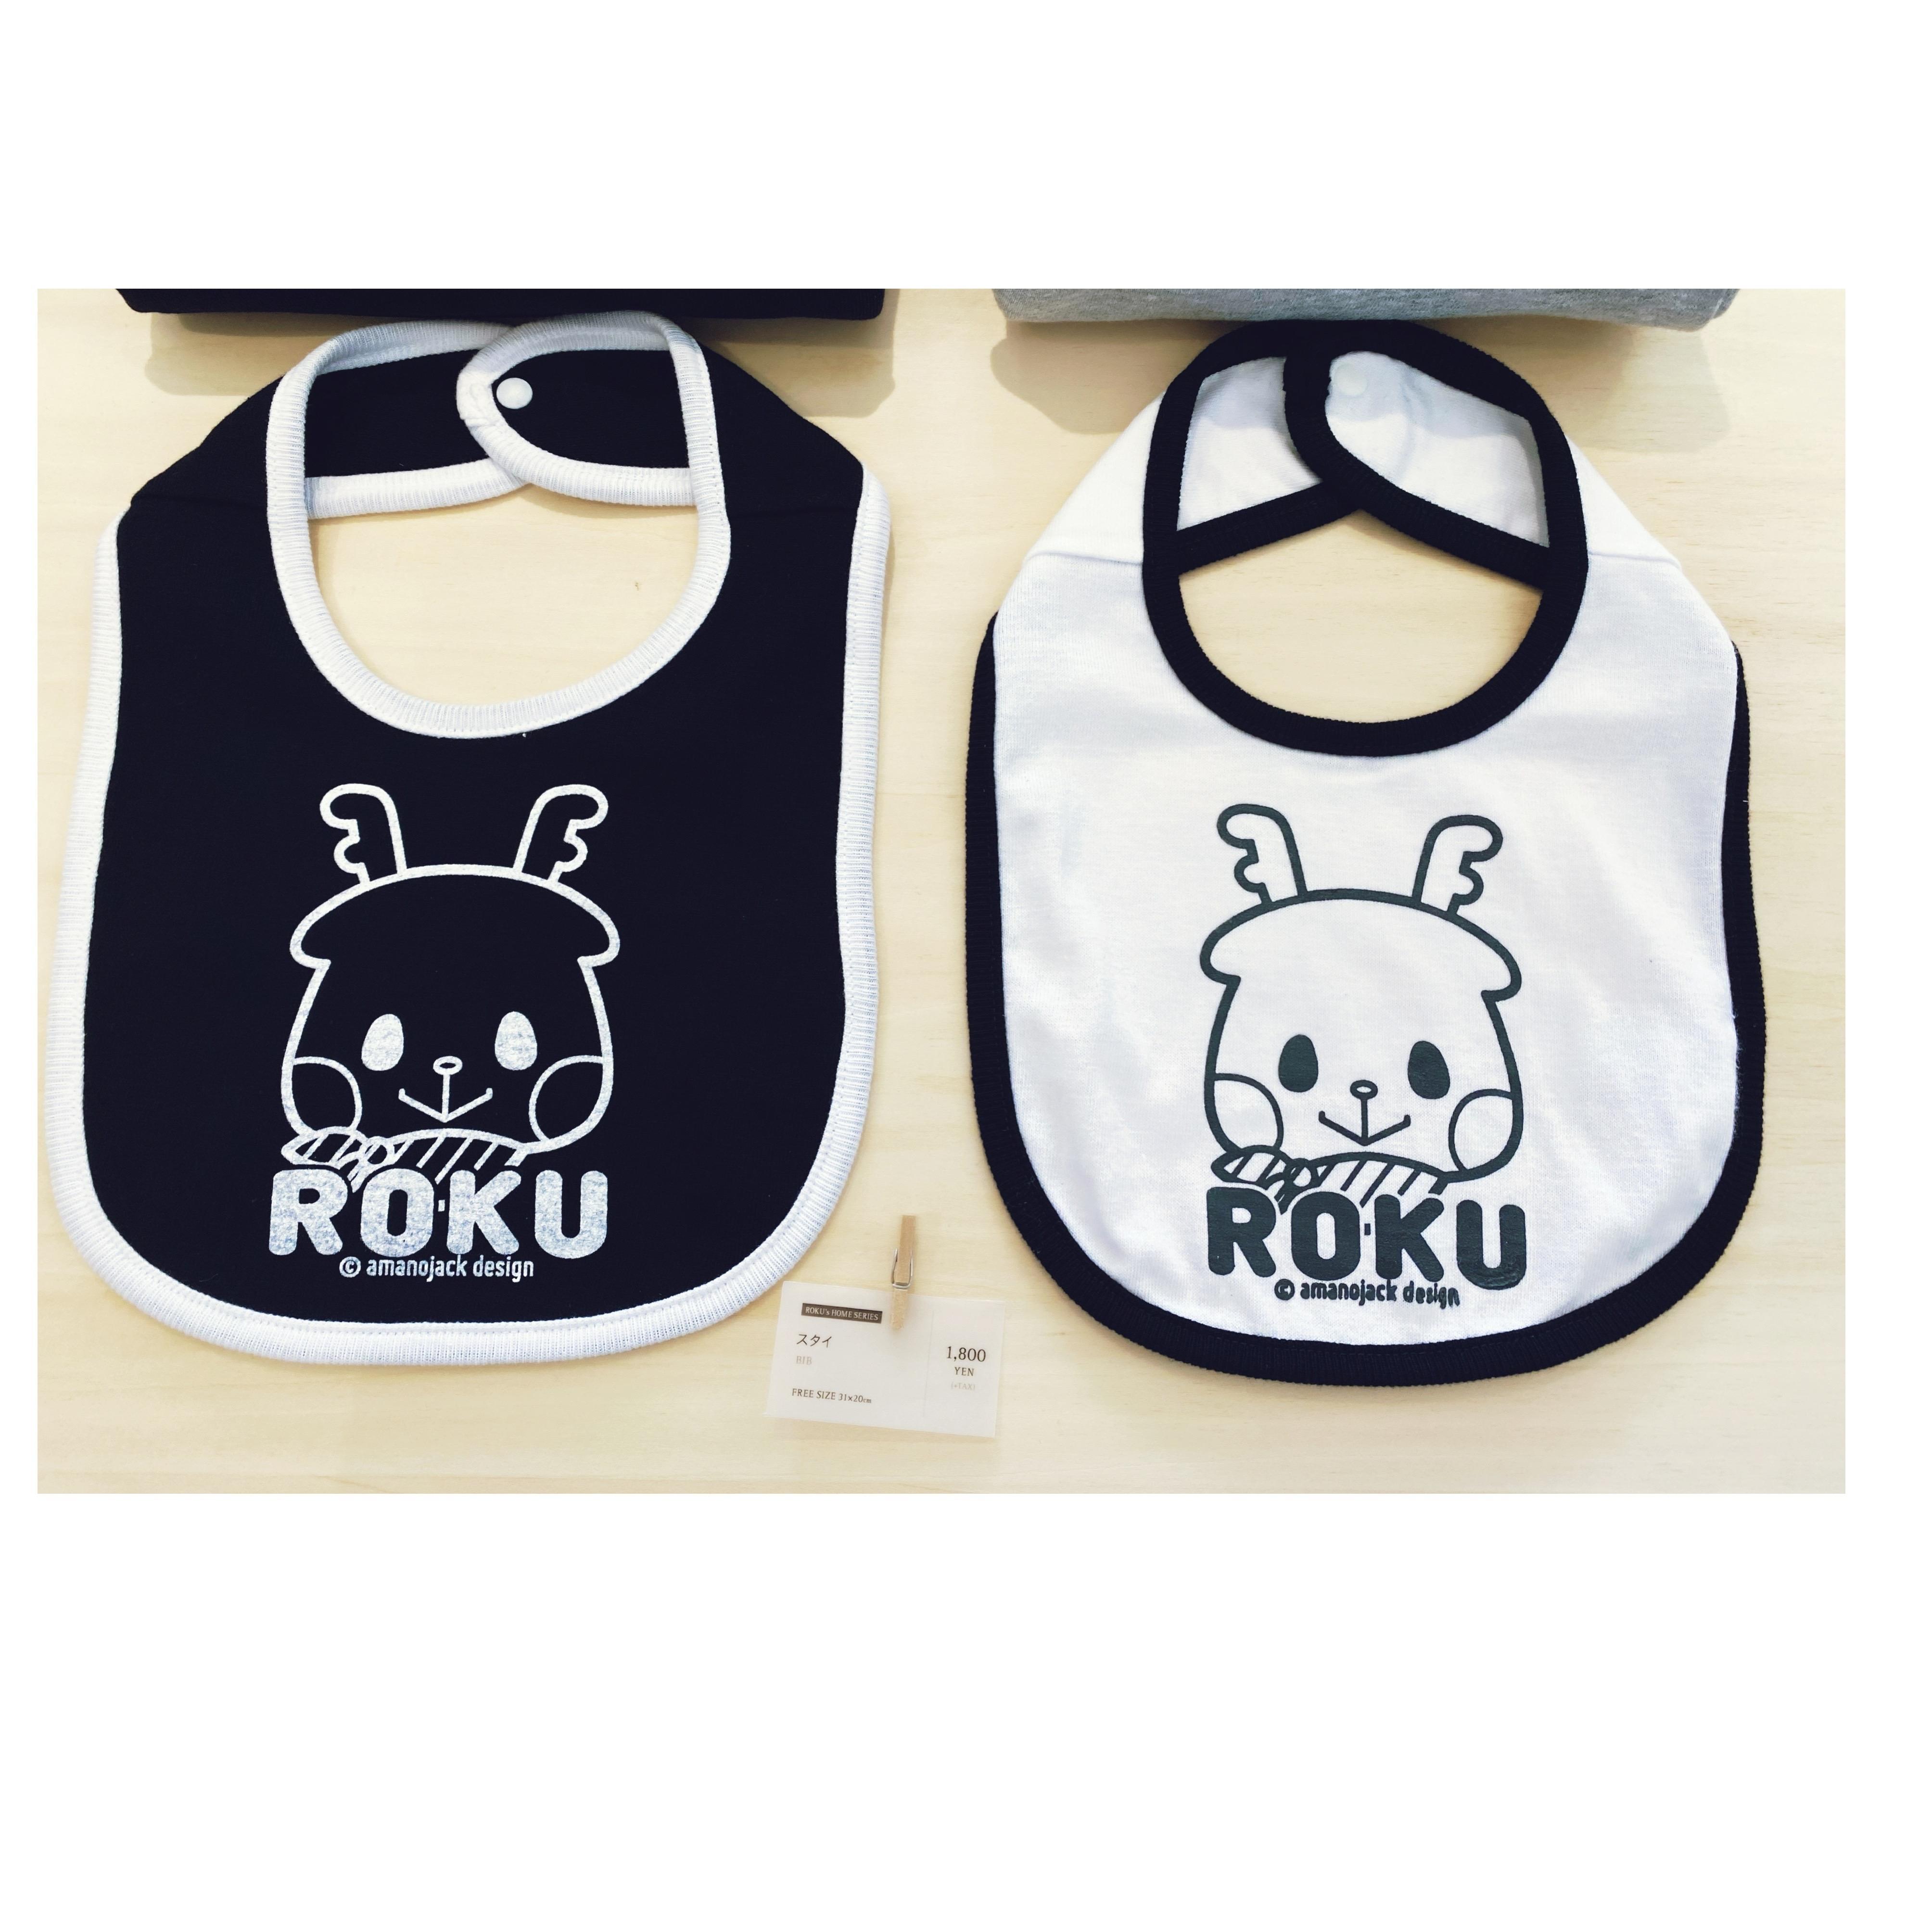 【ROKU HOME 限定商品】スタイ.靴下